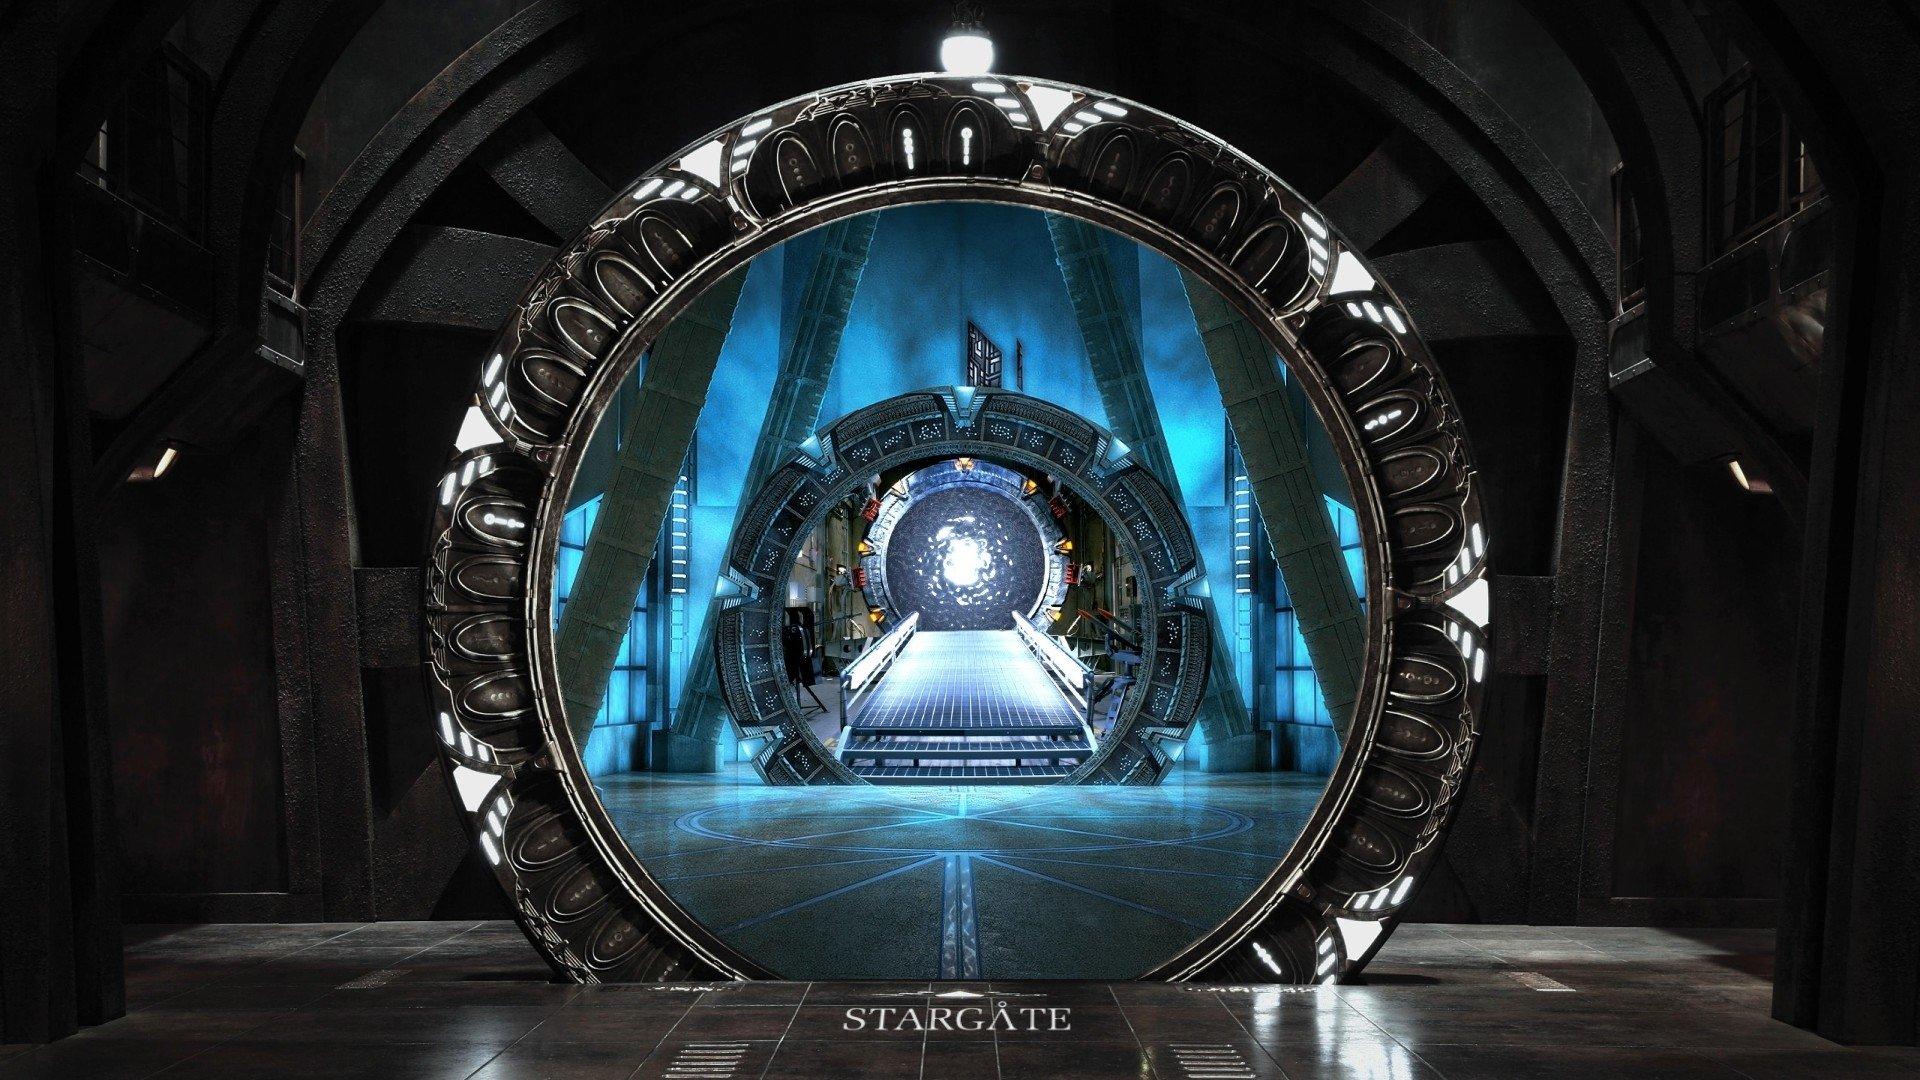 Stargate HD Wallpaper on WallpaperSafari